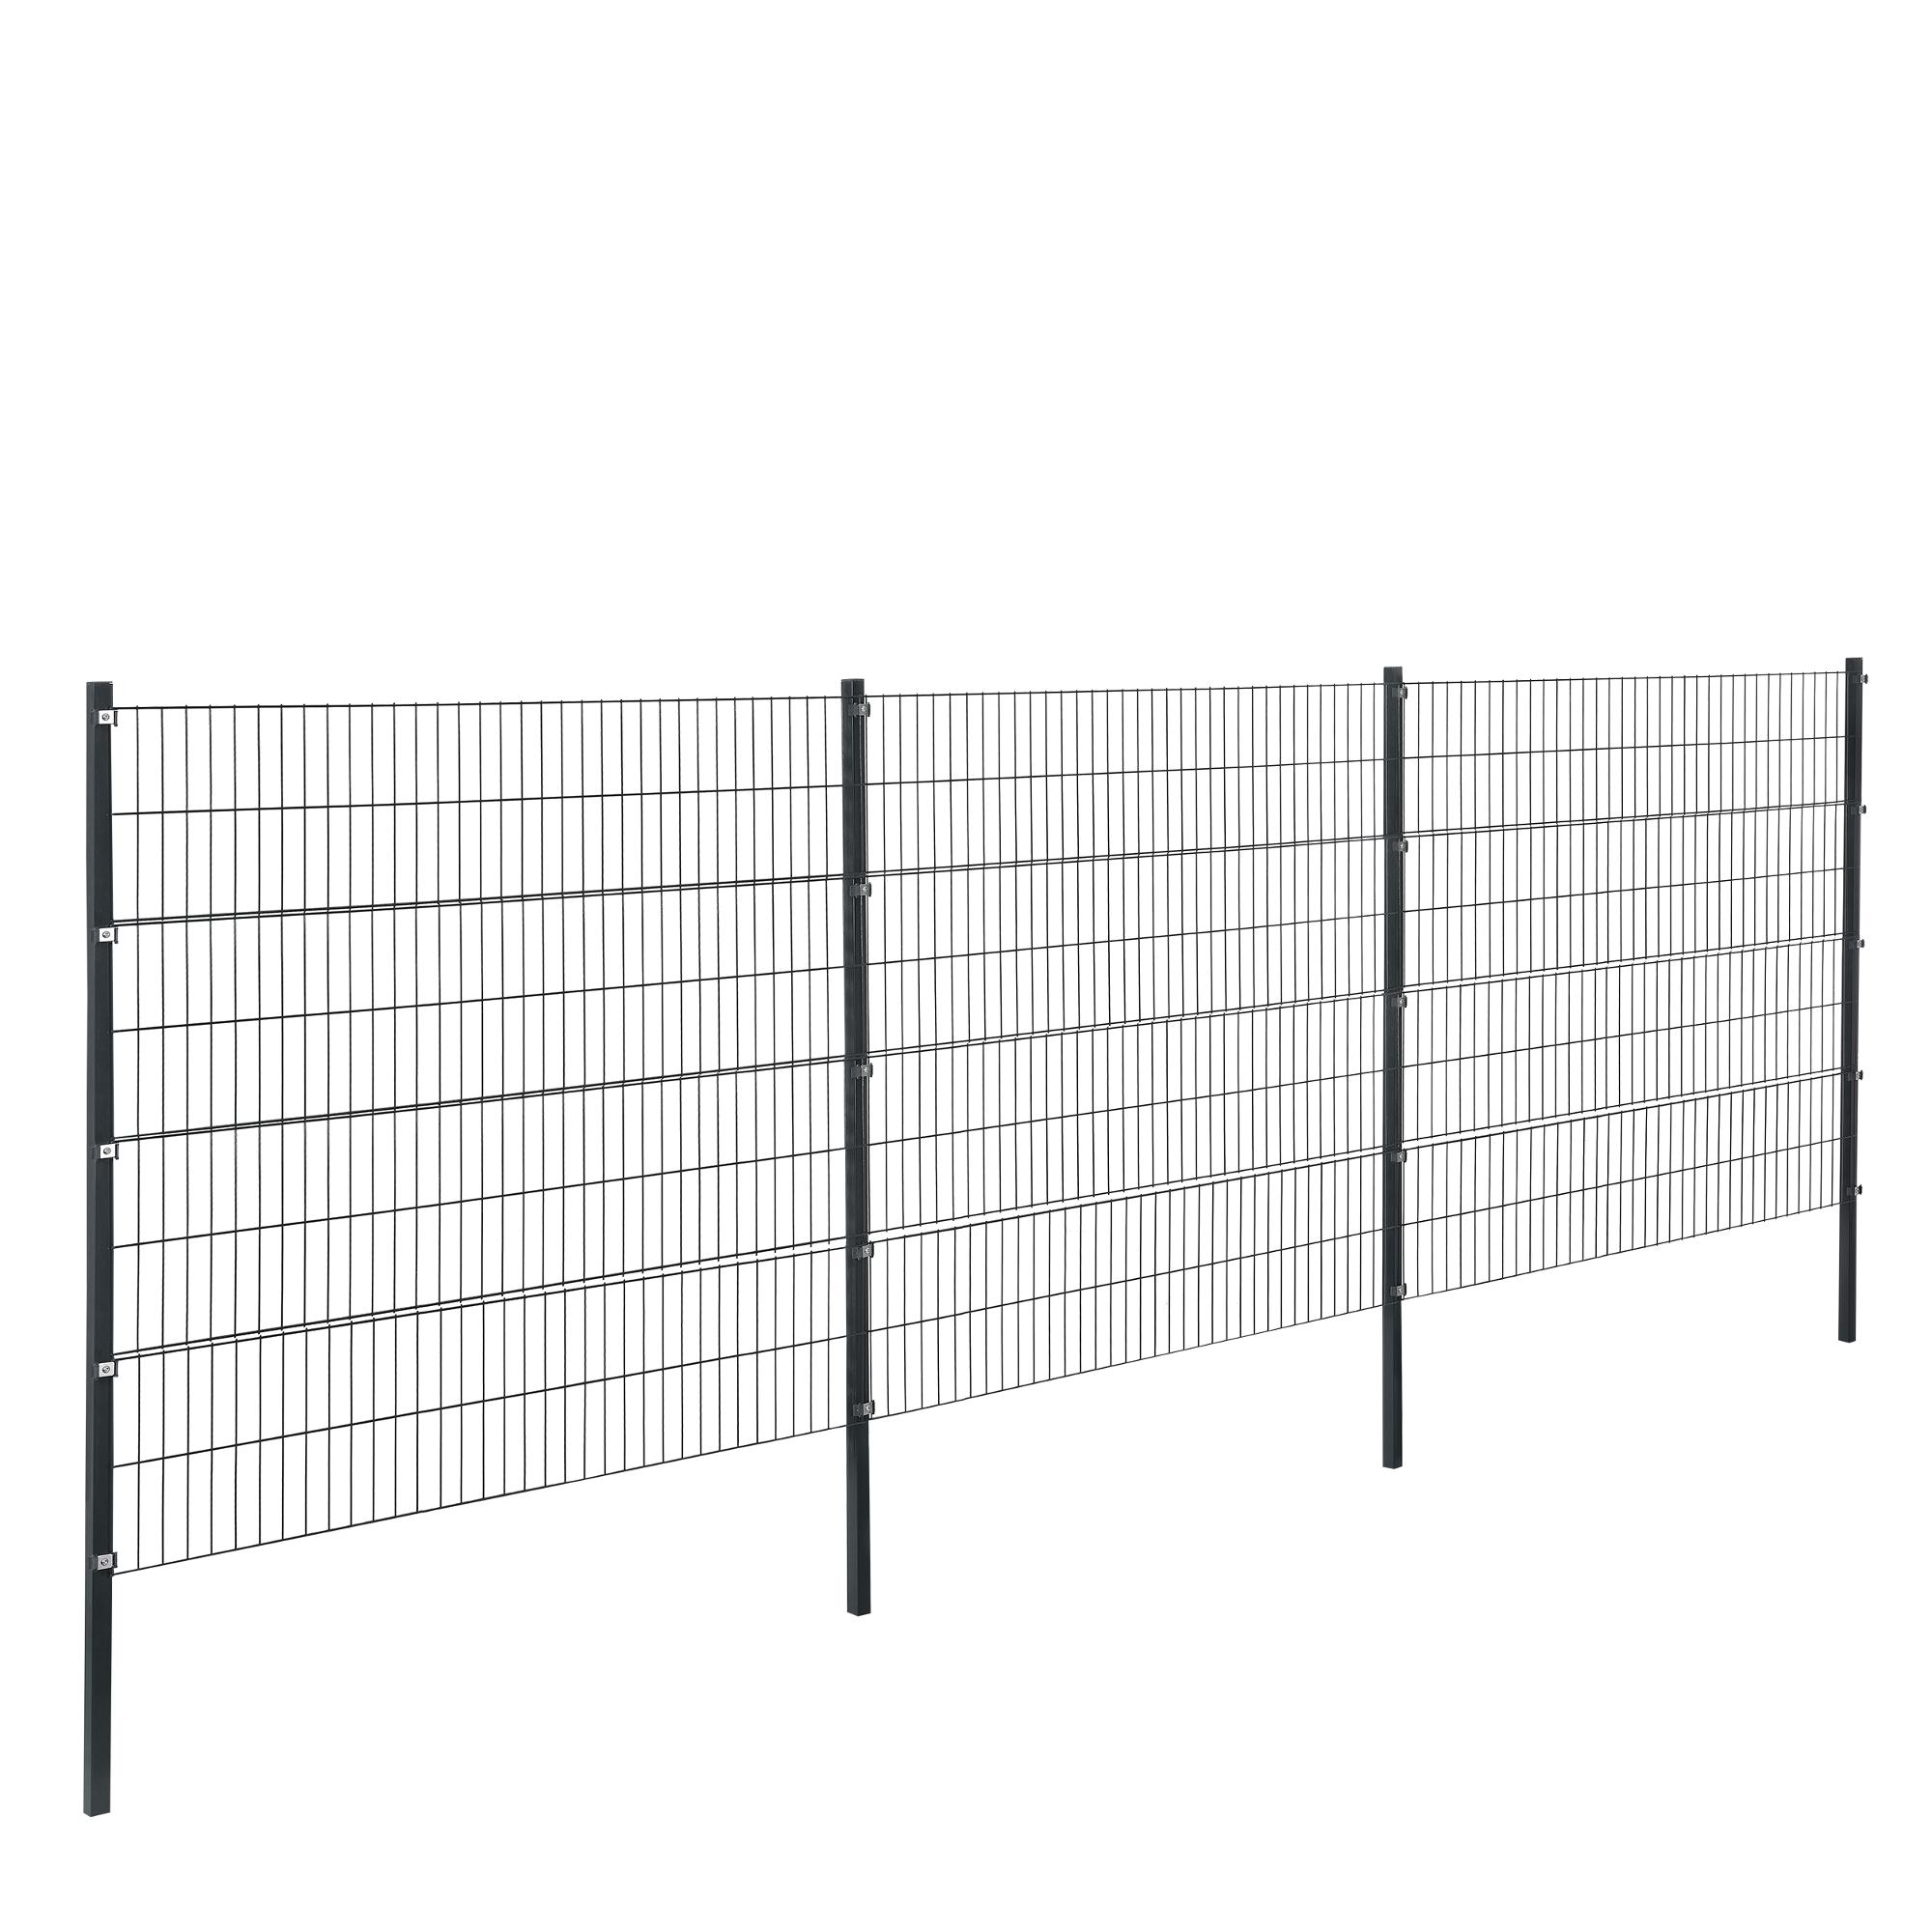 pro tec] Gartenzaun 6x1 6m Grau Doppelstab Zaun Set Gittermatten